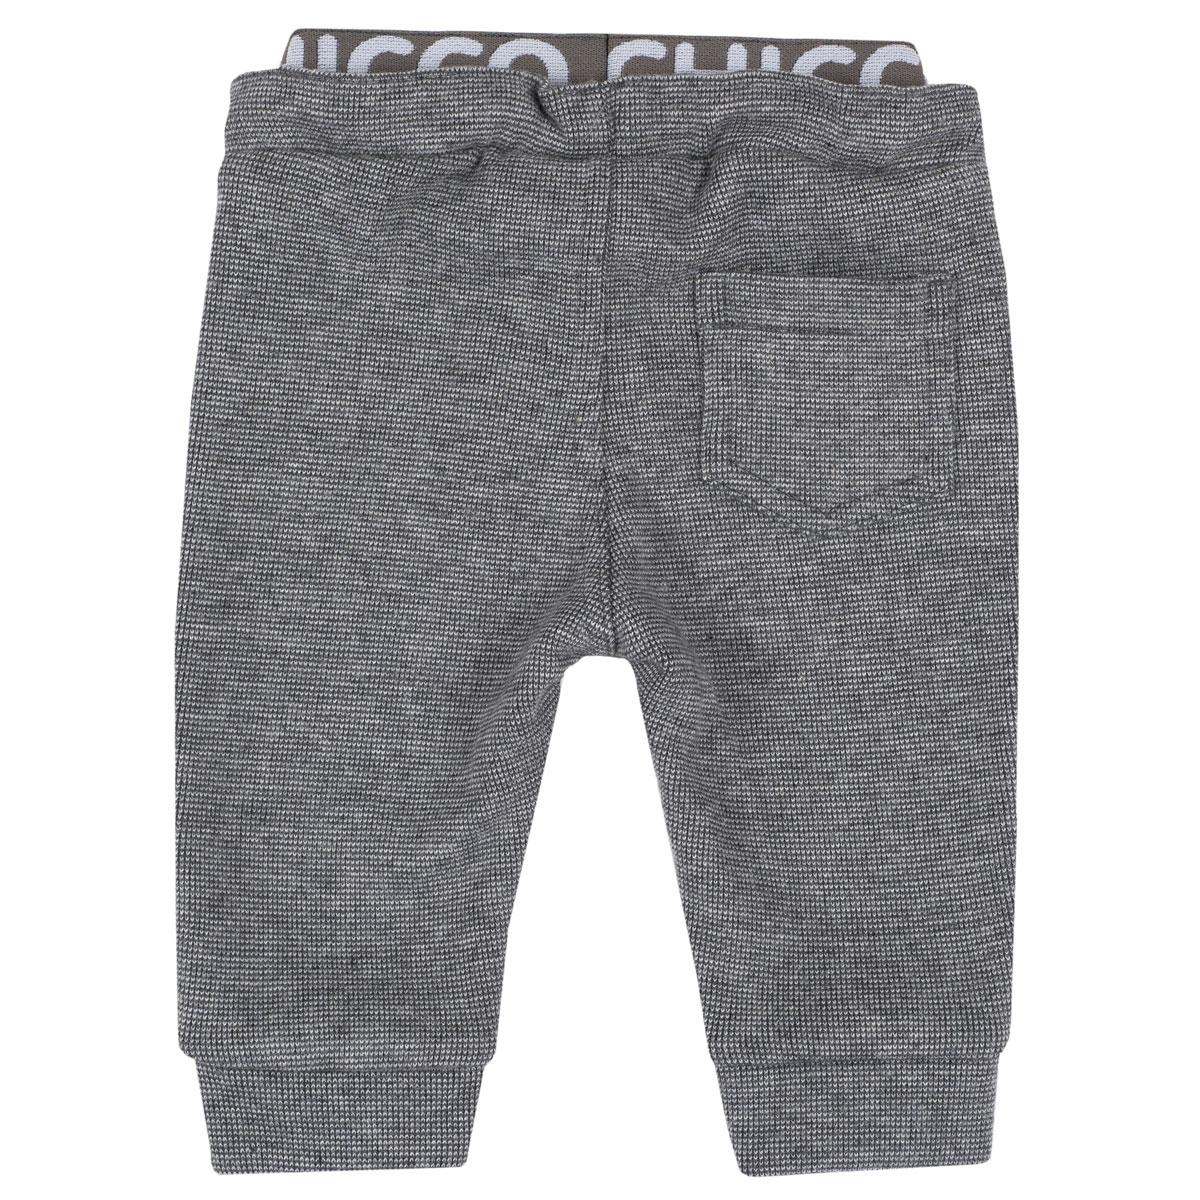 Pantaloni copii lungi Chicco, negru cu albastru, 08037